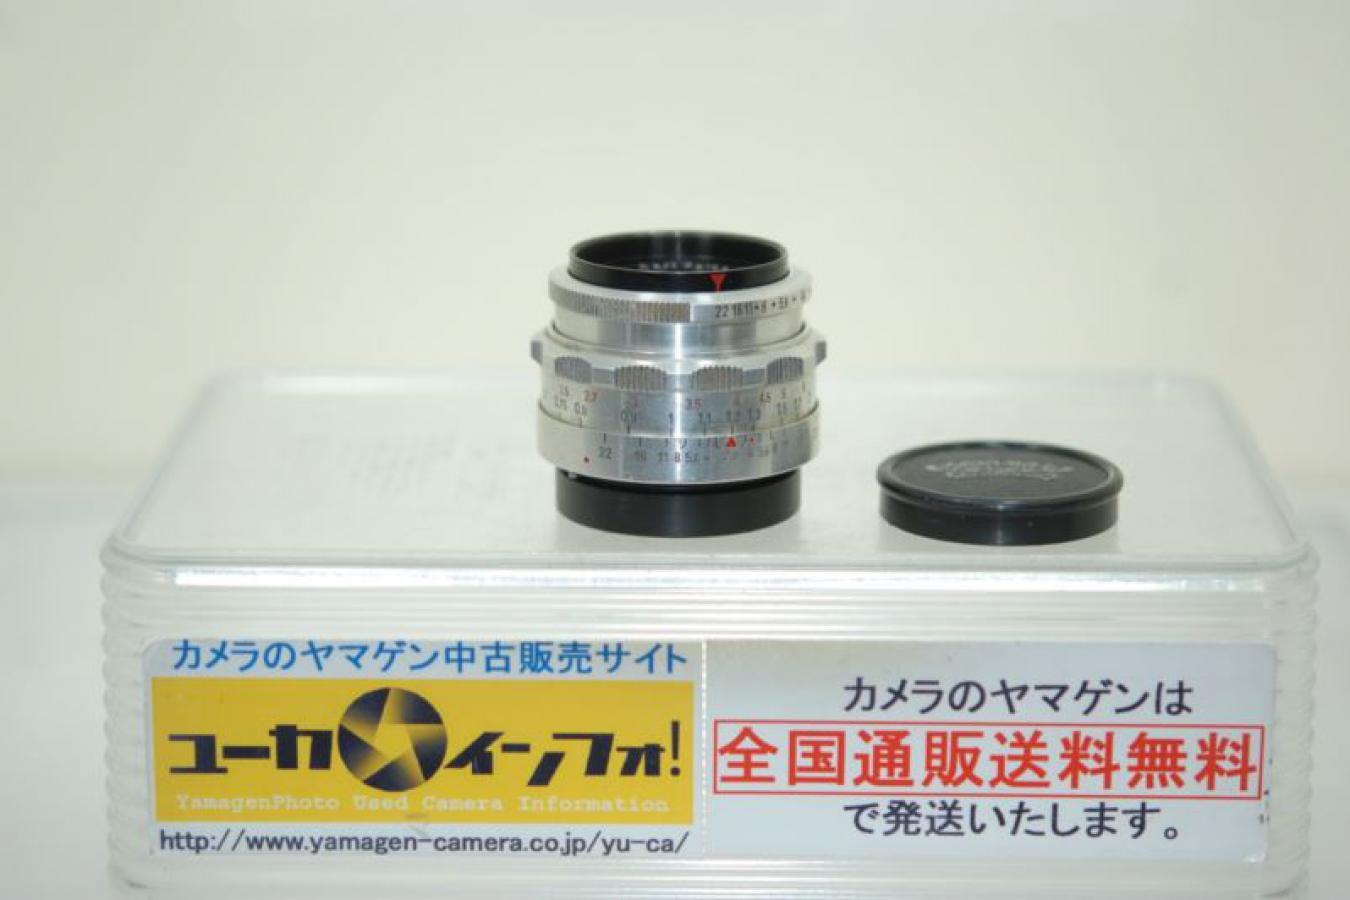 Carl Zeiss Jena テッサー 50mm F2.8 【エキザクタマウントレンズ】